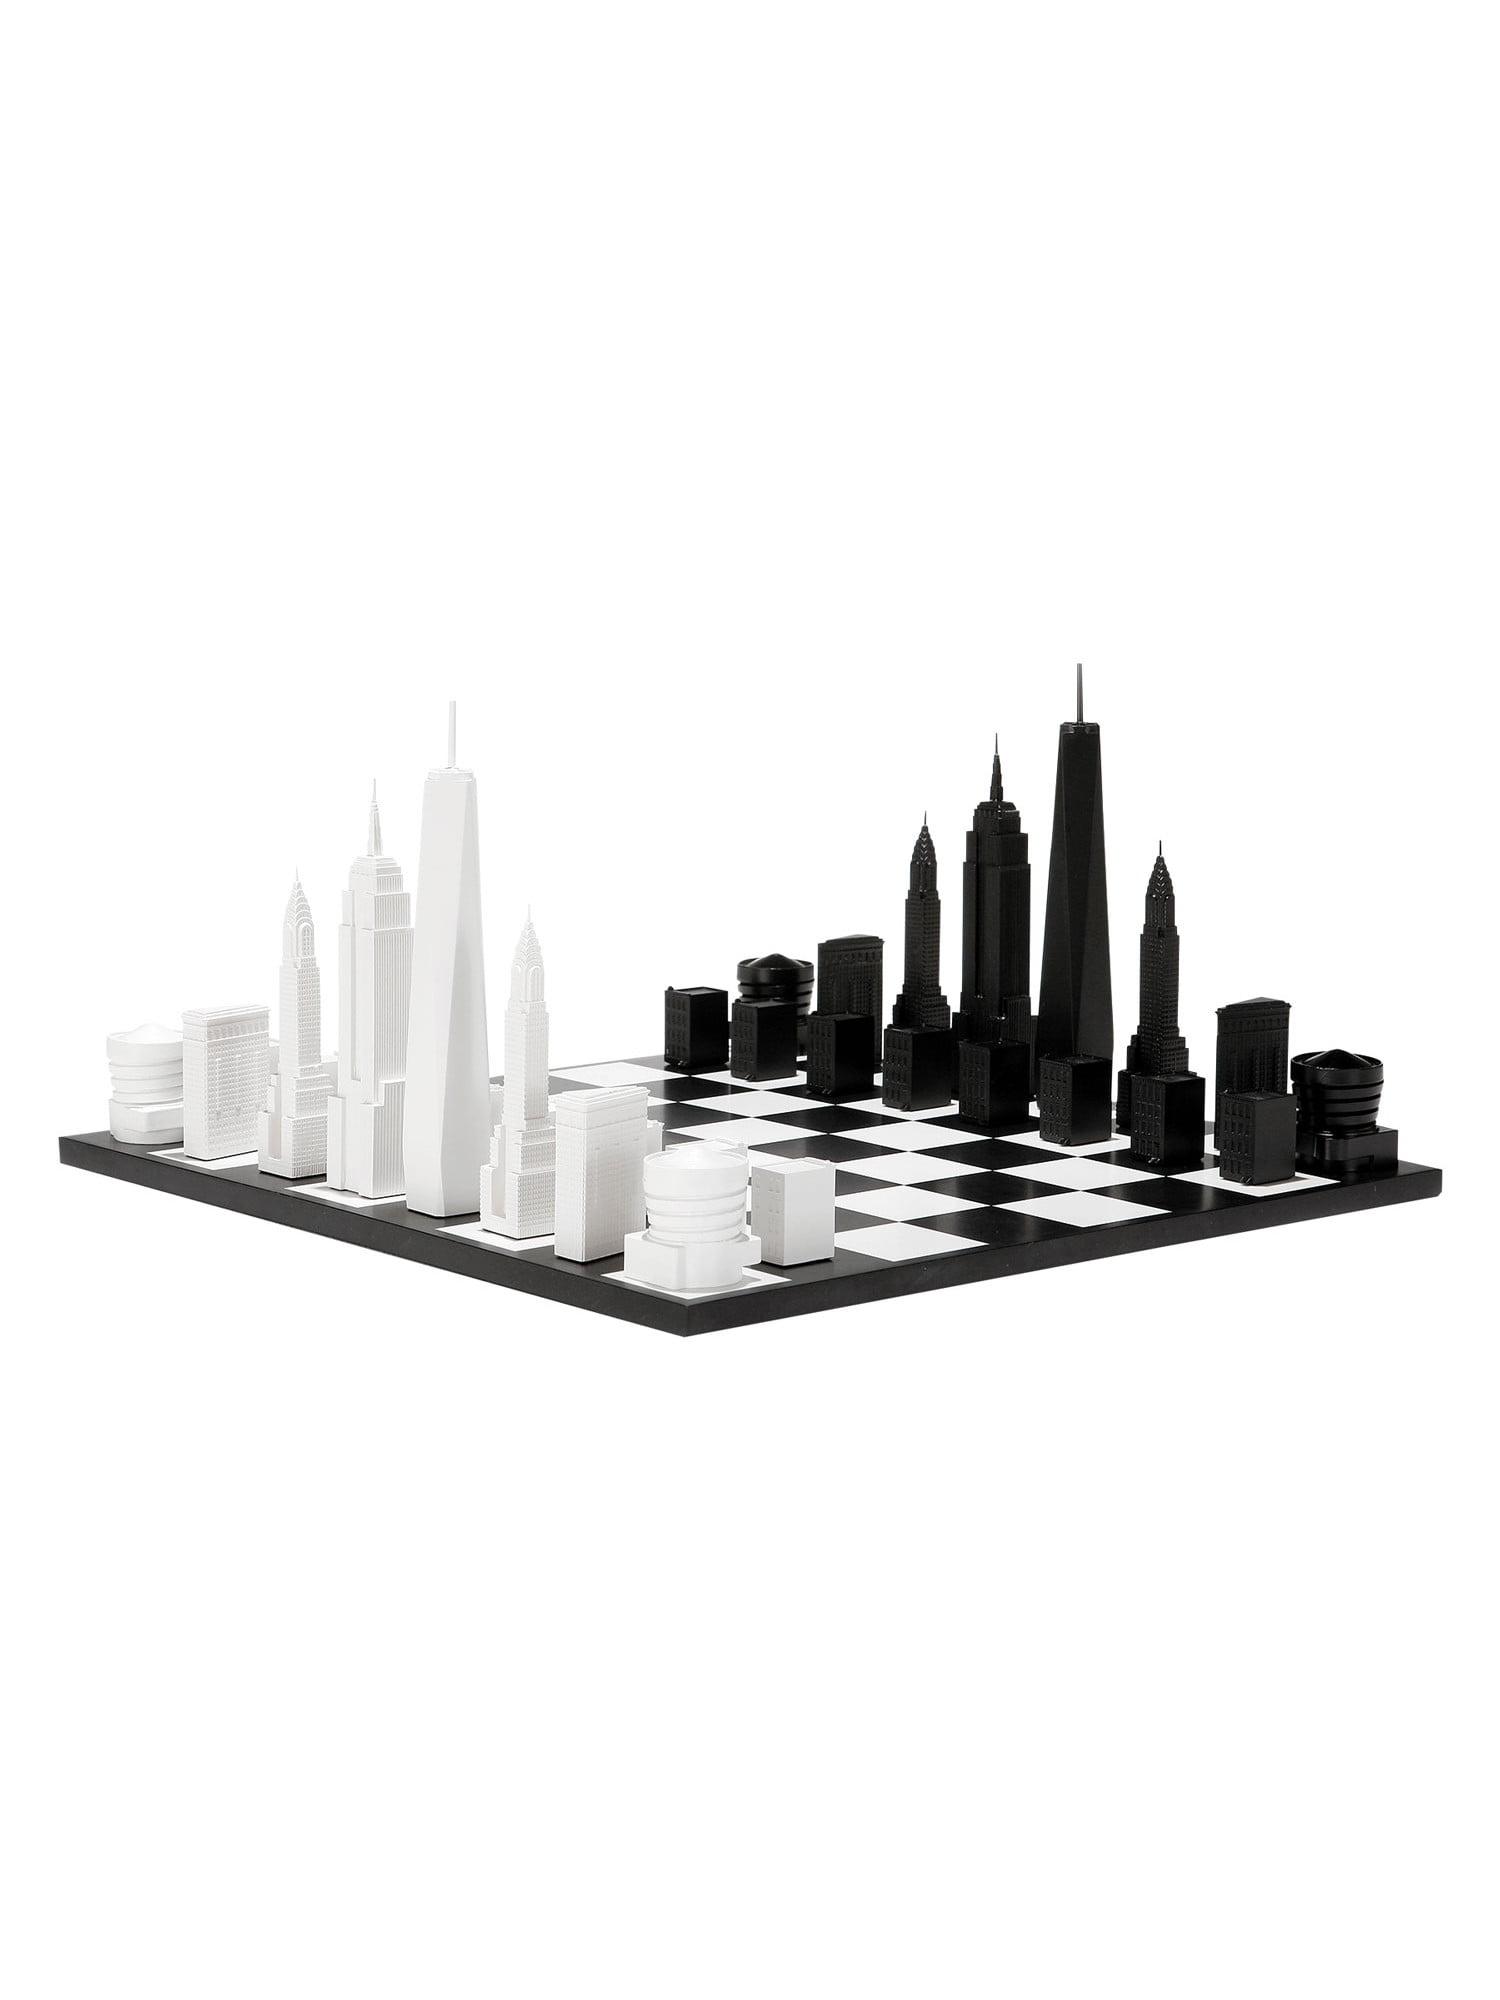 "Skyline Chess Set New York City Manhattan Buildings as Pieces 8"" Tall King by SKYLINE CHESS"